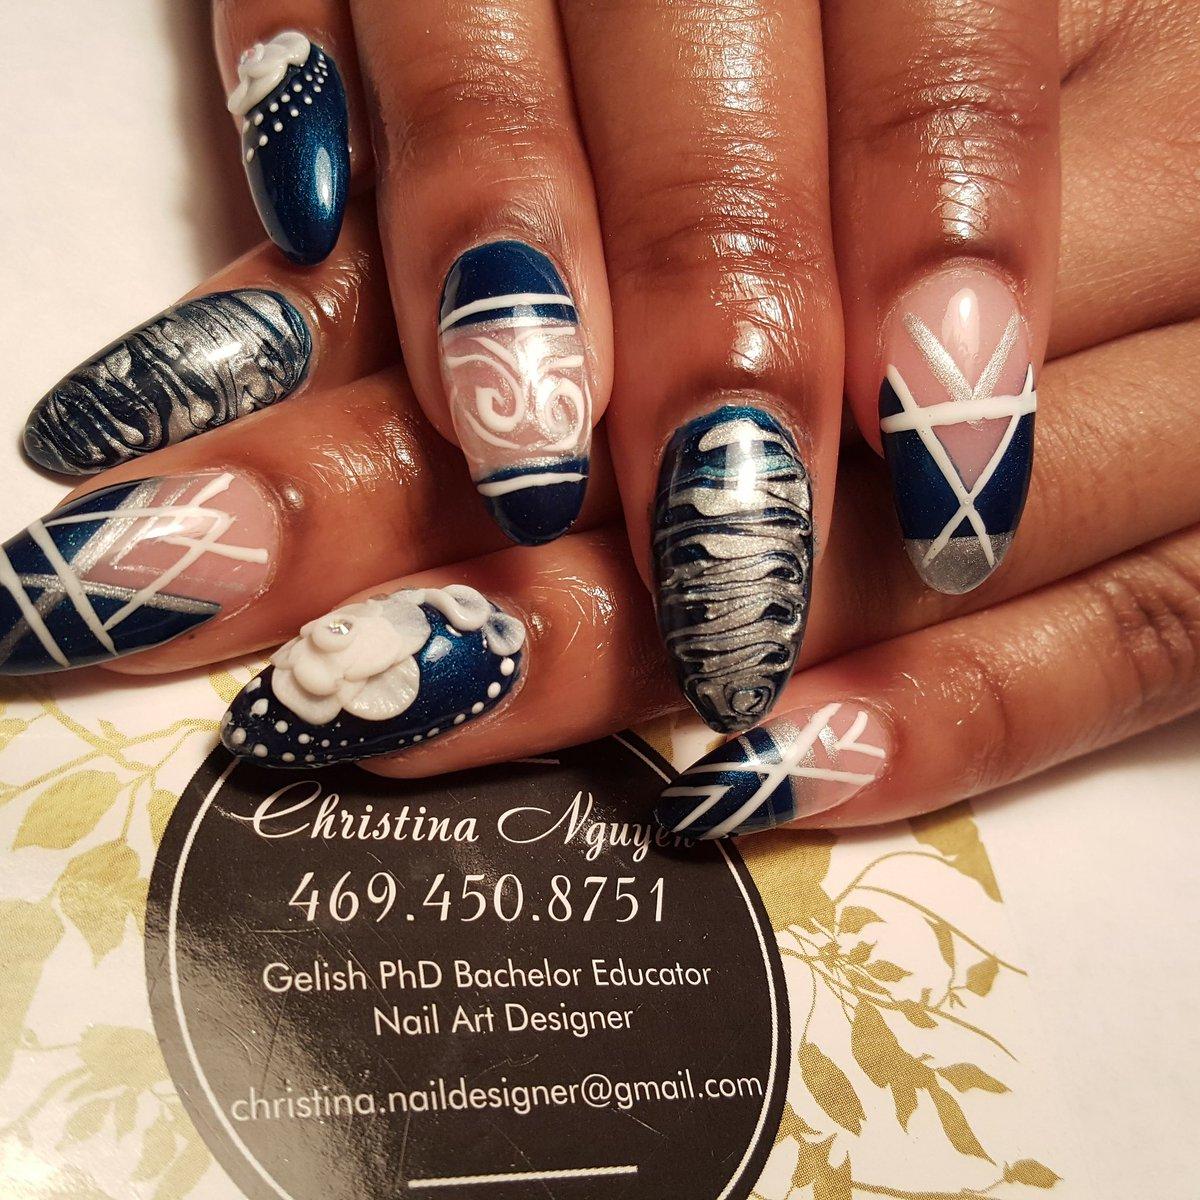 Xtina Art Nails On Twitter The Top Best Nail In Dallas Dfw 469 450 8751 Nailart Nailswag Beauty